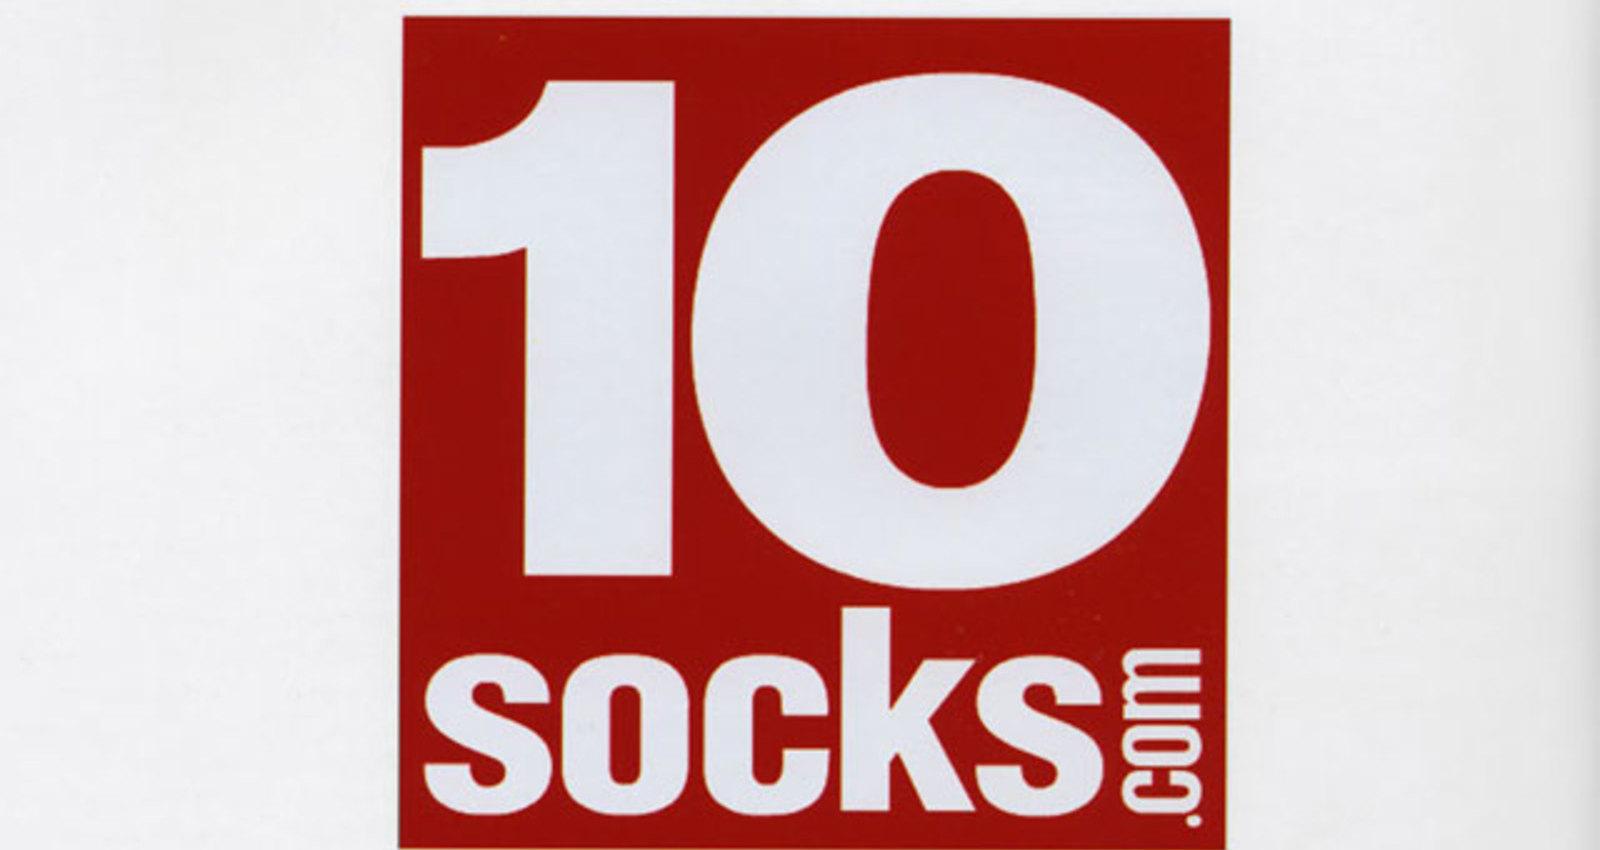 10socks